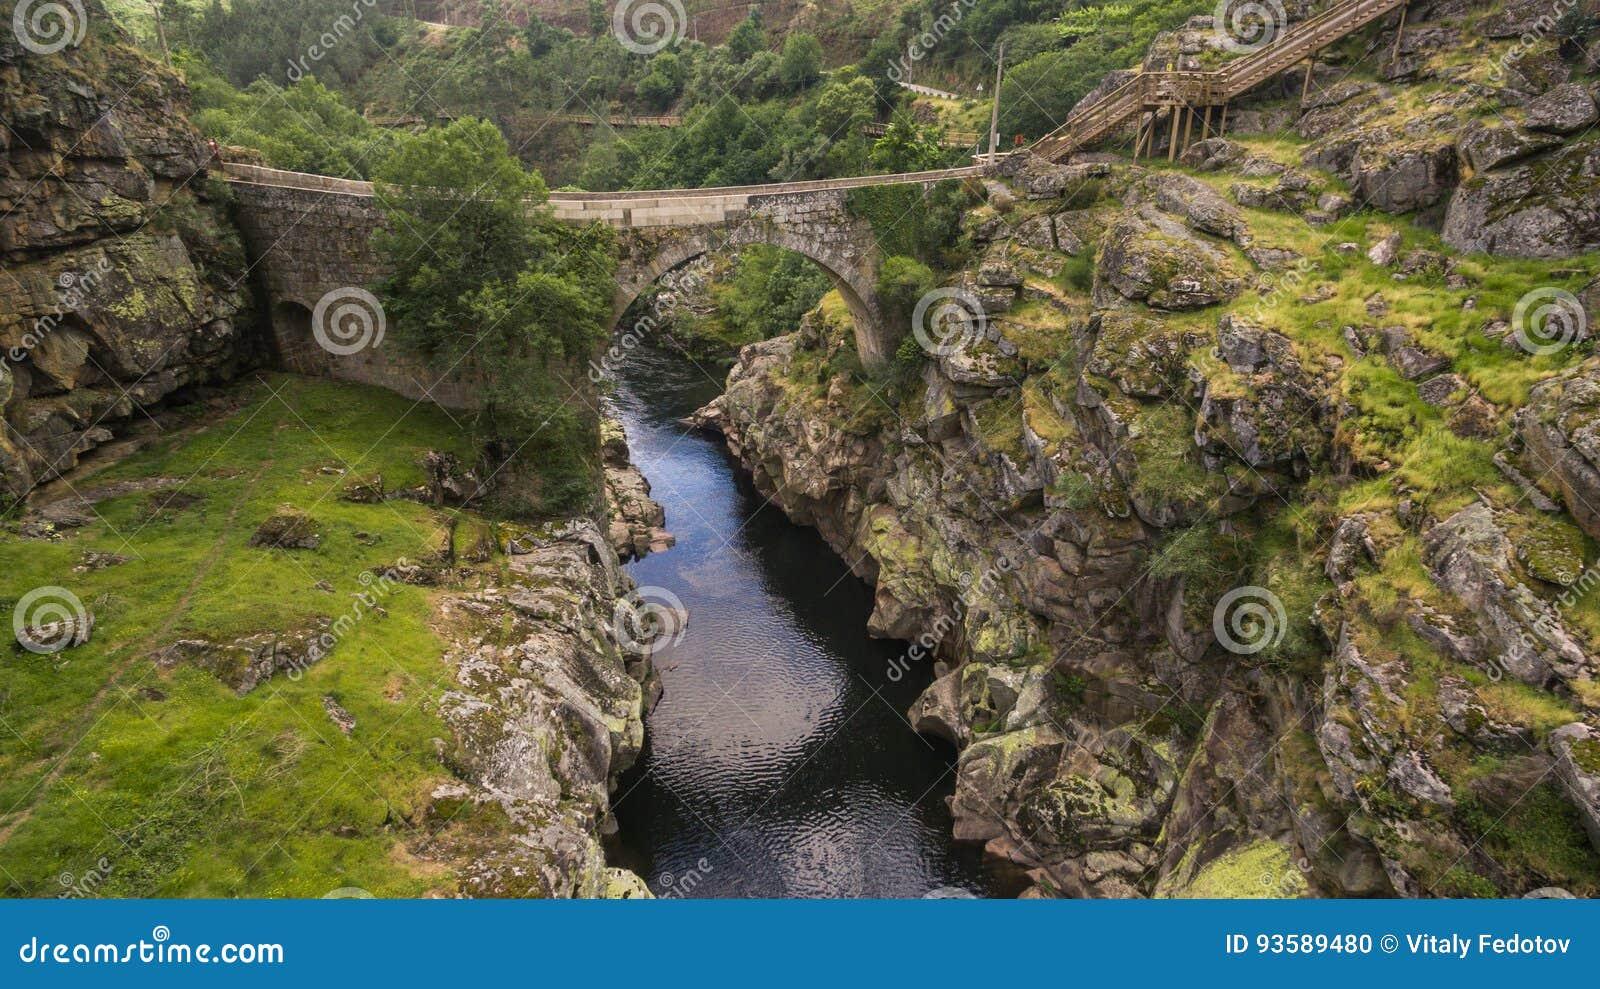 Fluss In Portugal vogelperspektive paiva natur gehwegen auf paiva fluss portugal